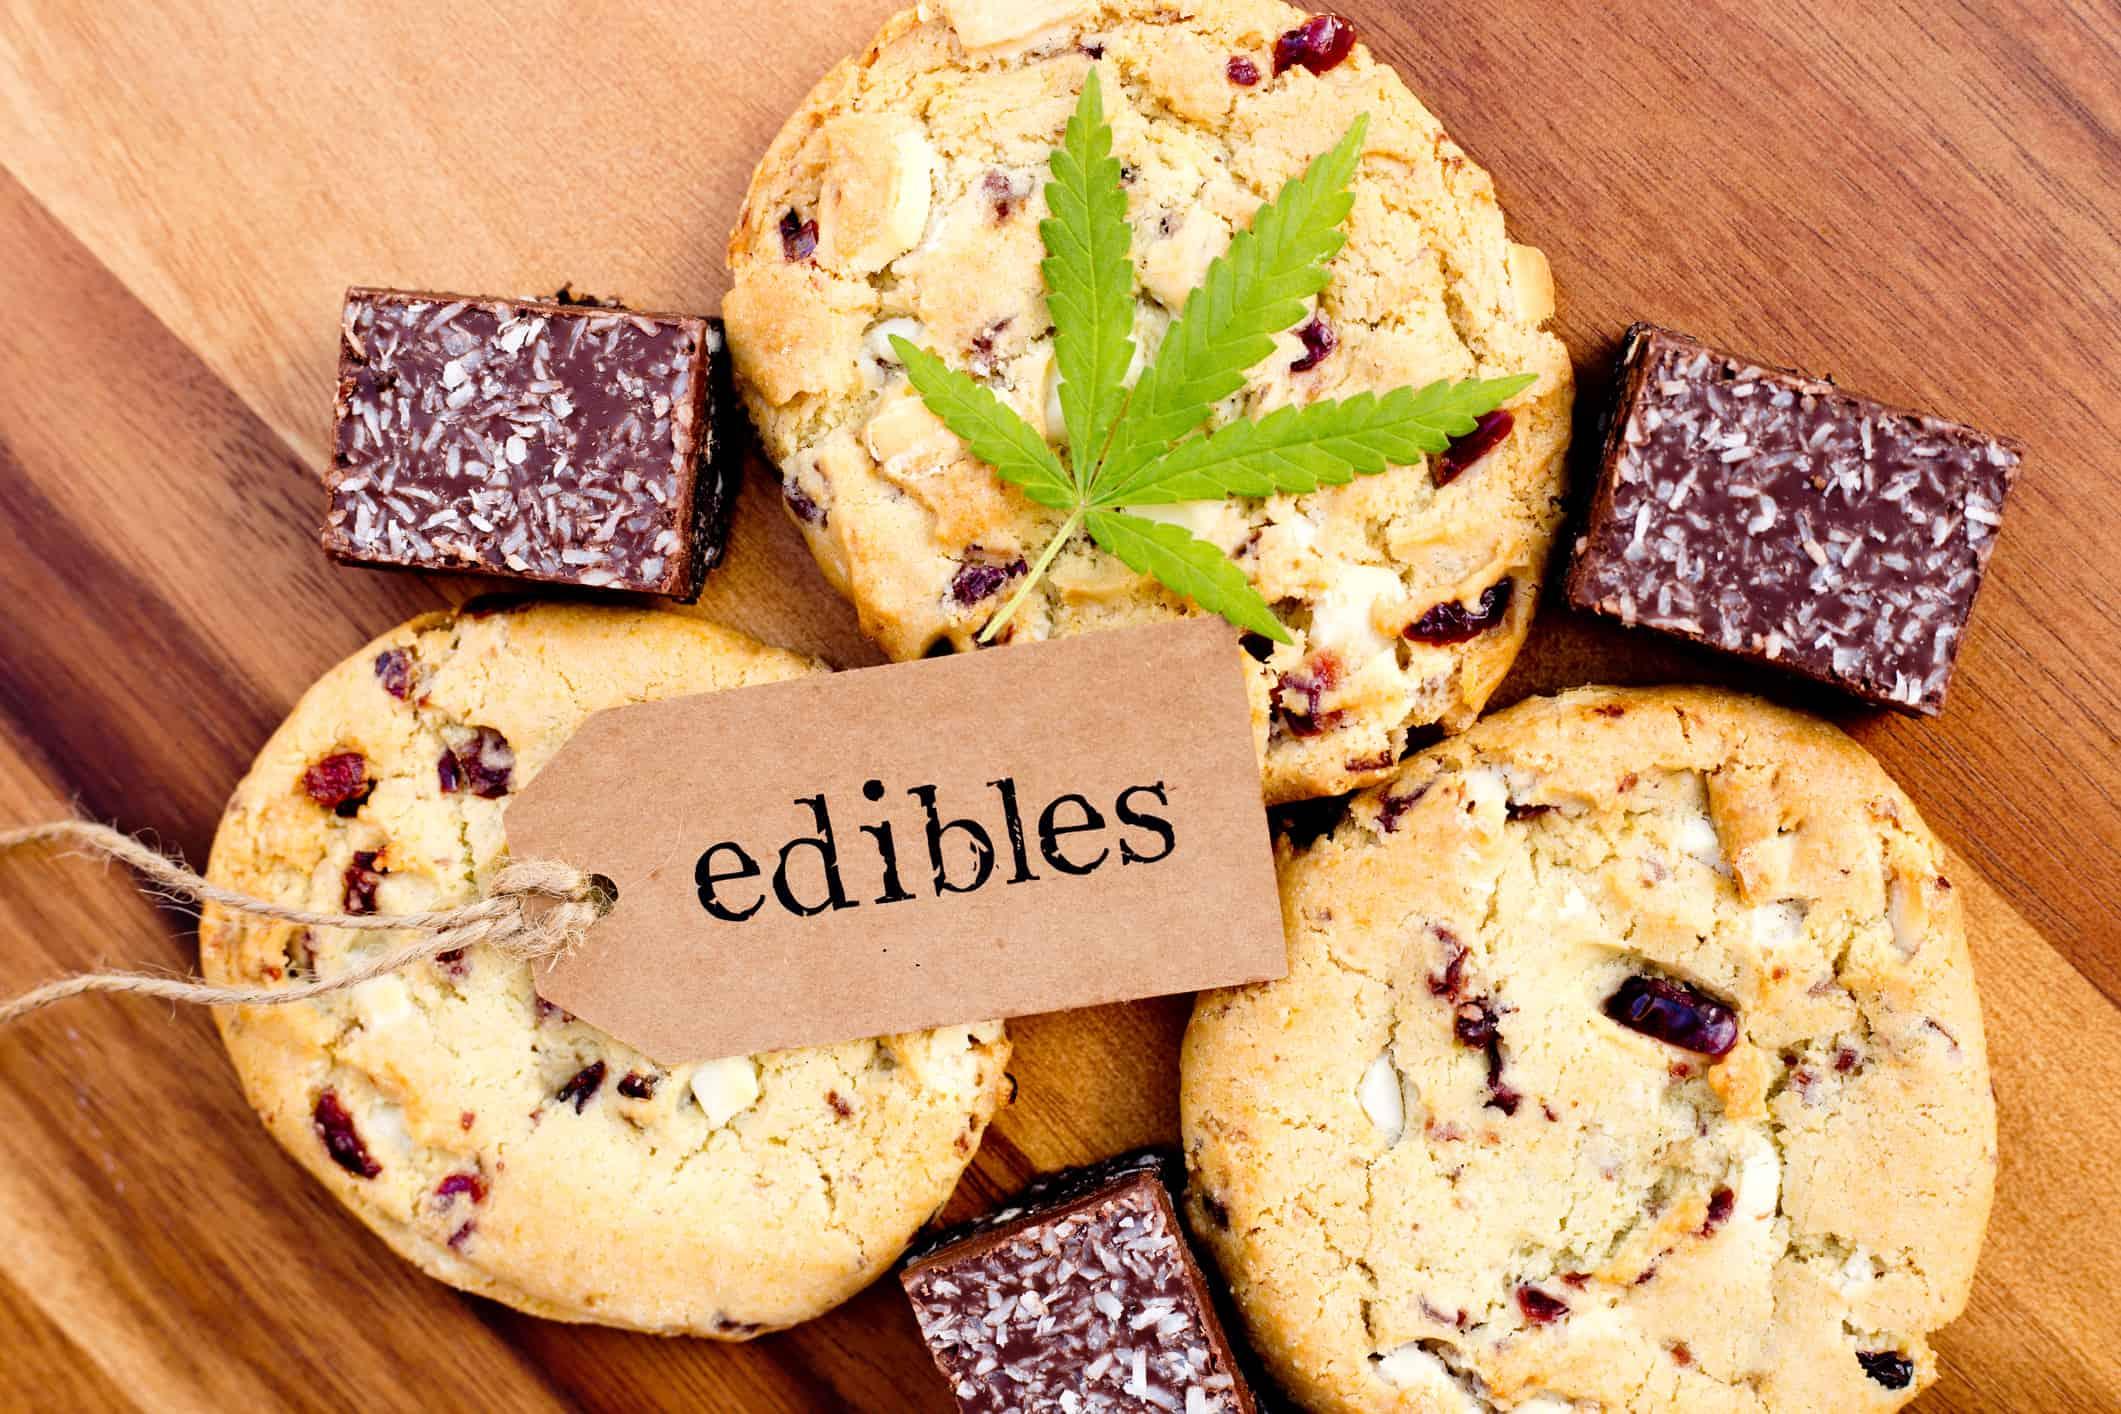 examle of legal cannabis edibles in Canada